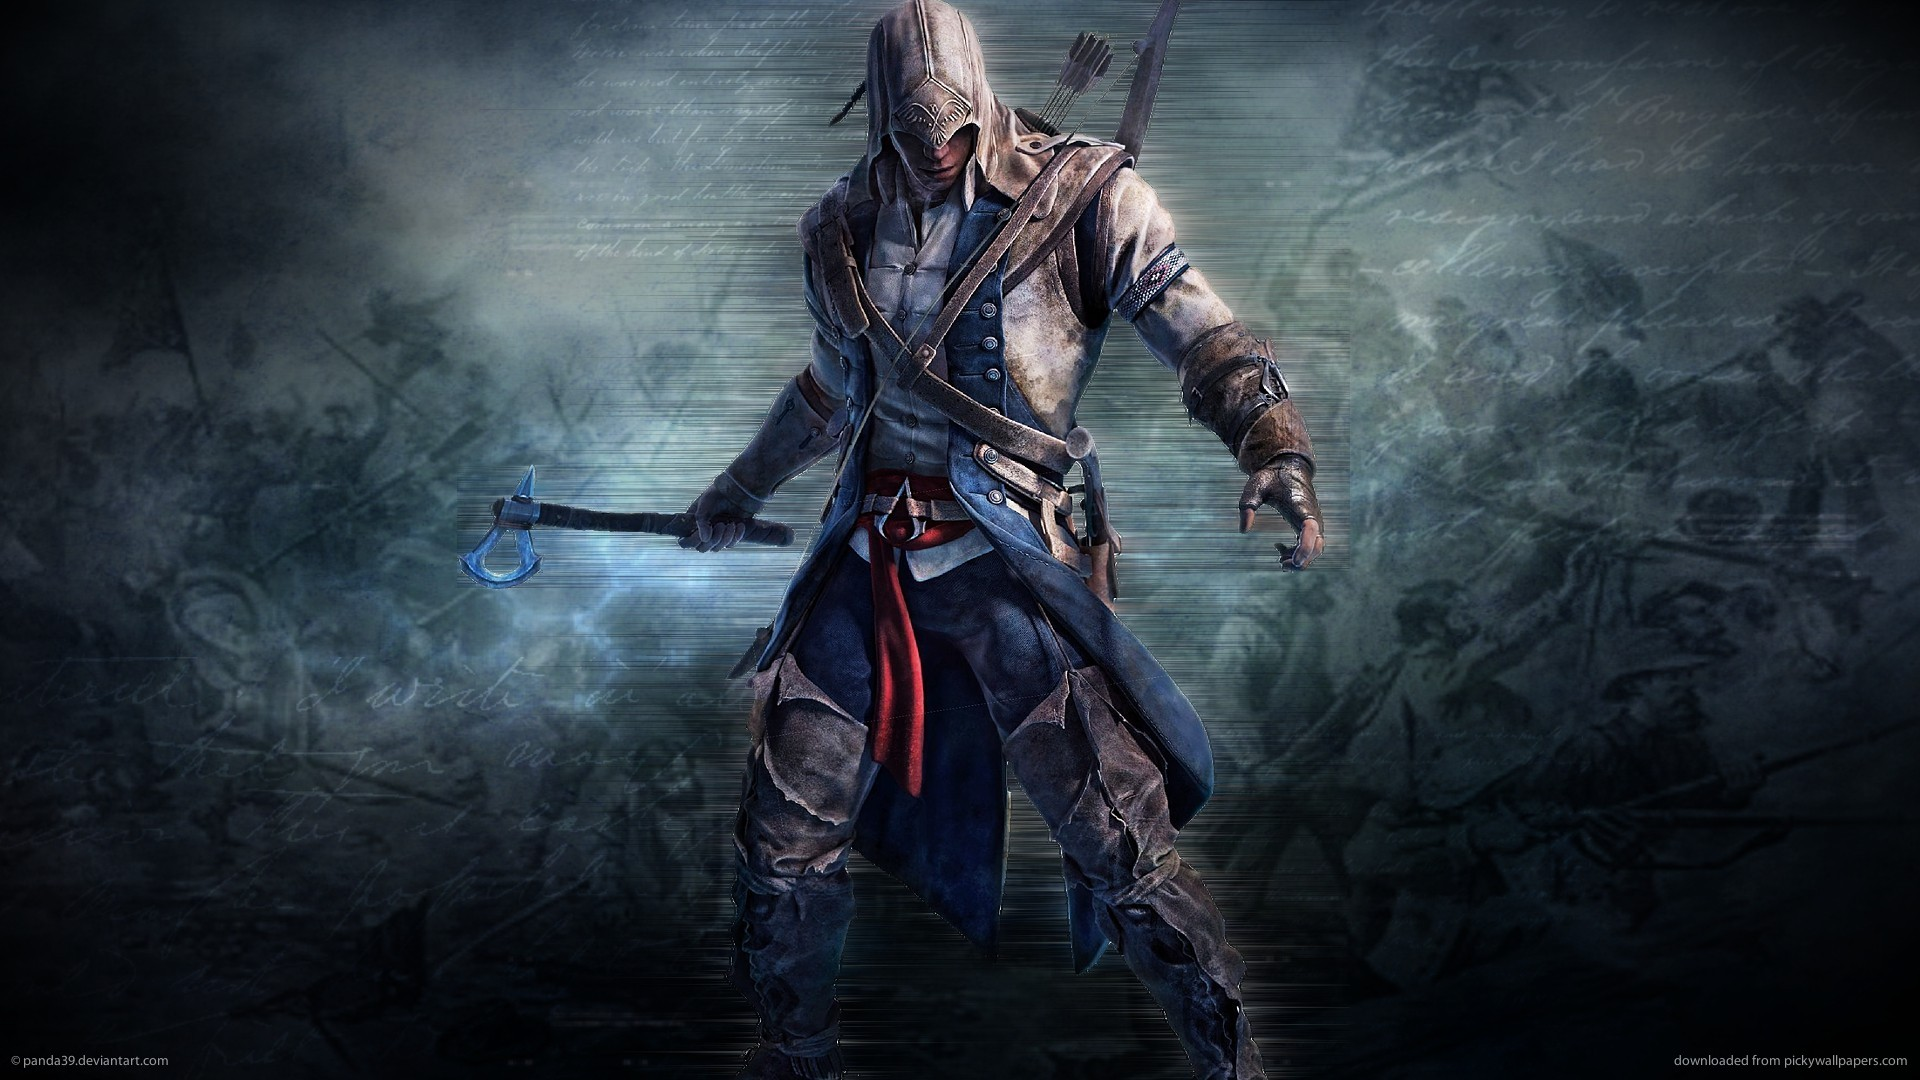 Download 1920x1080 Assassins Creed 3 Tomahawk Wallpaper 1920x1080